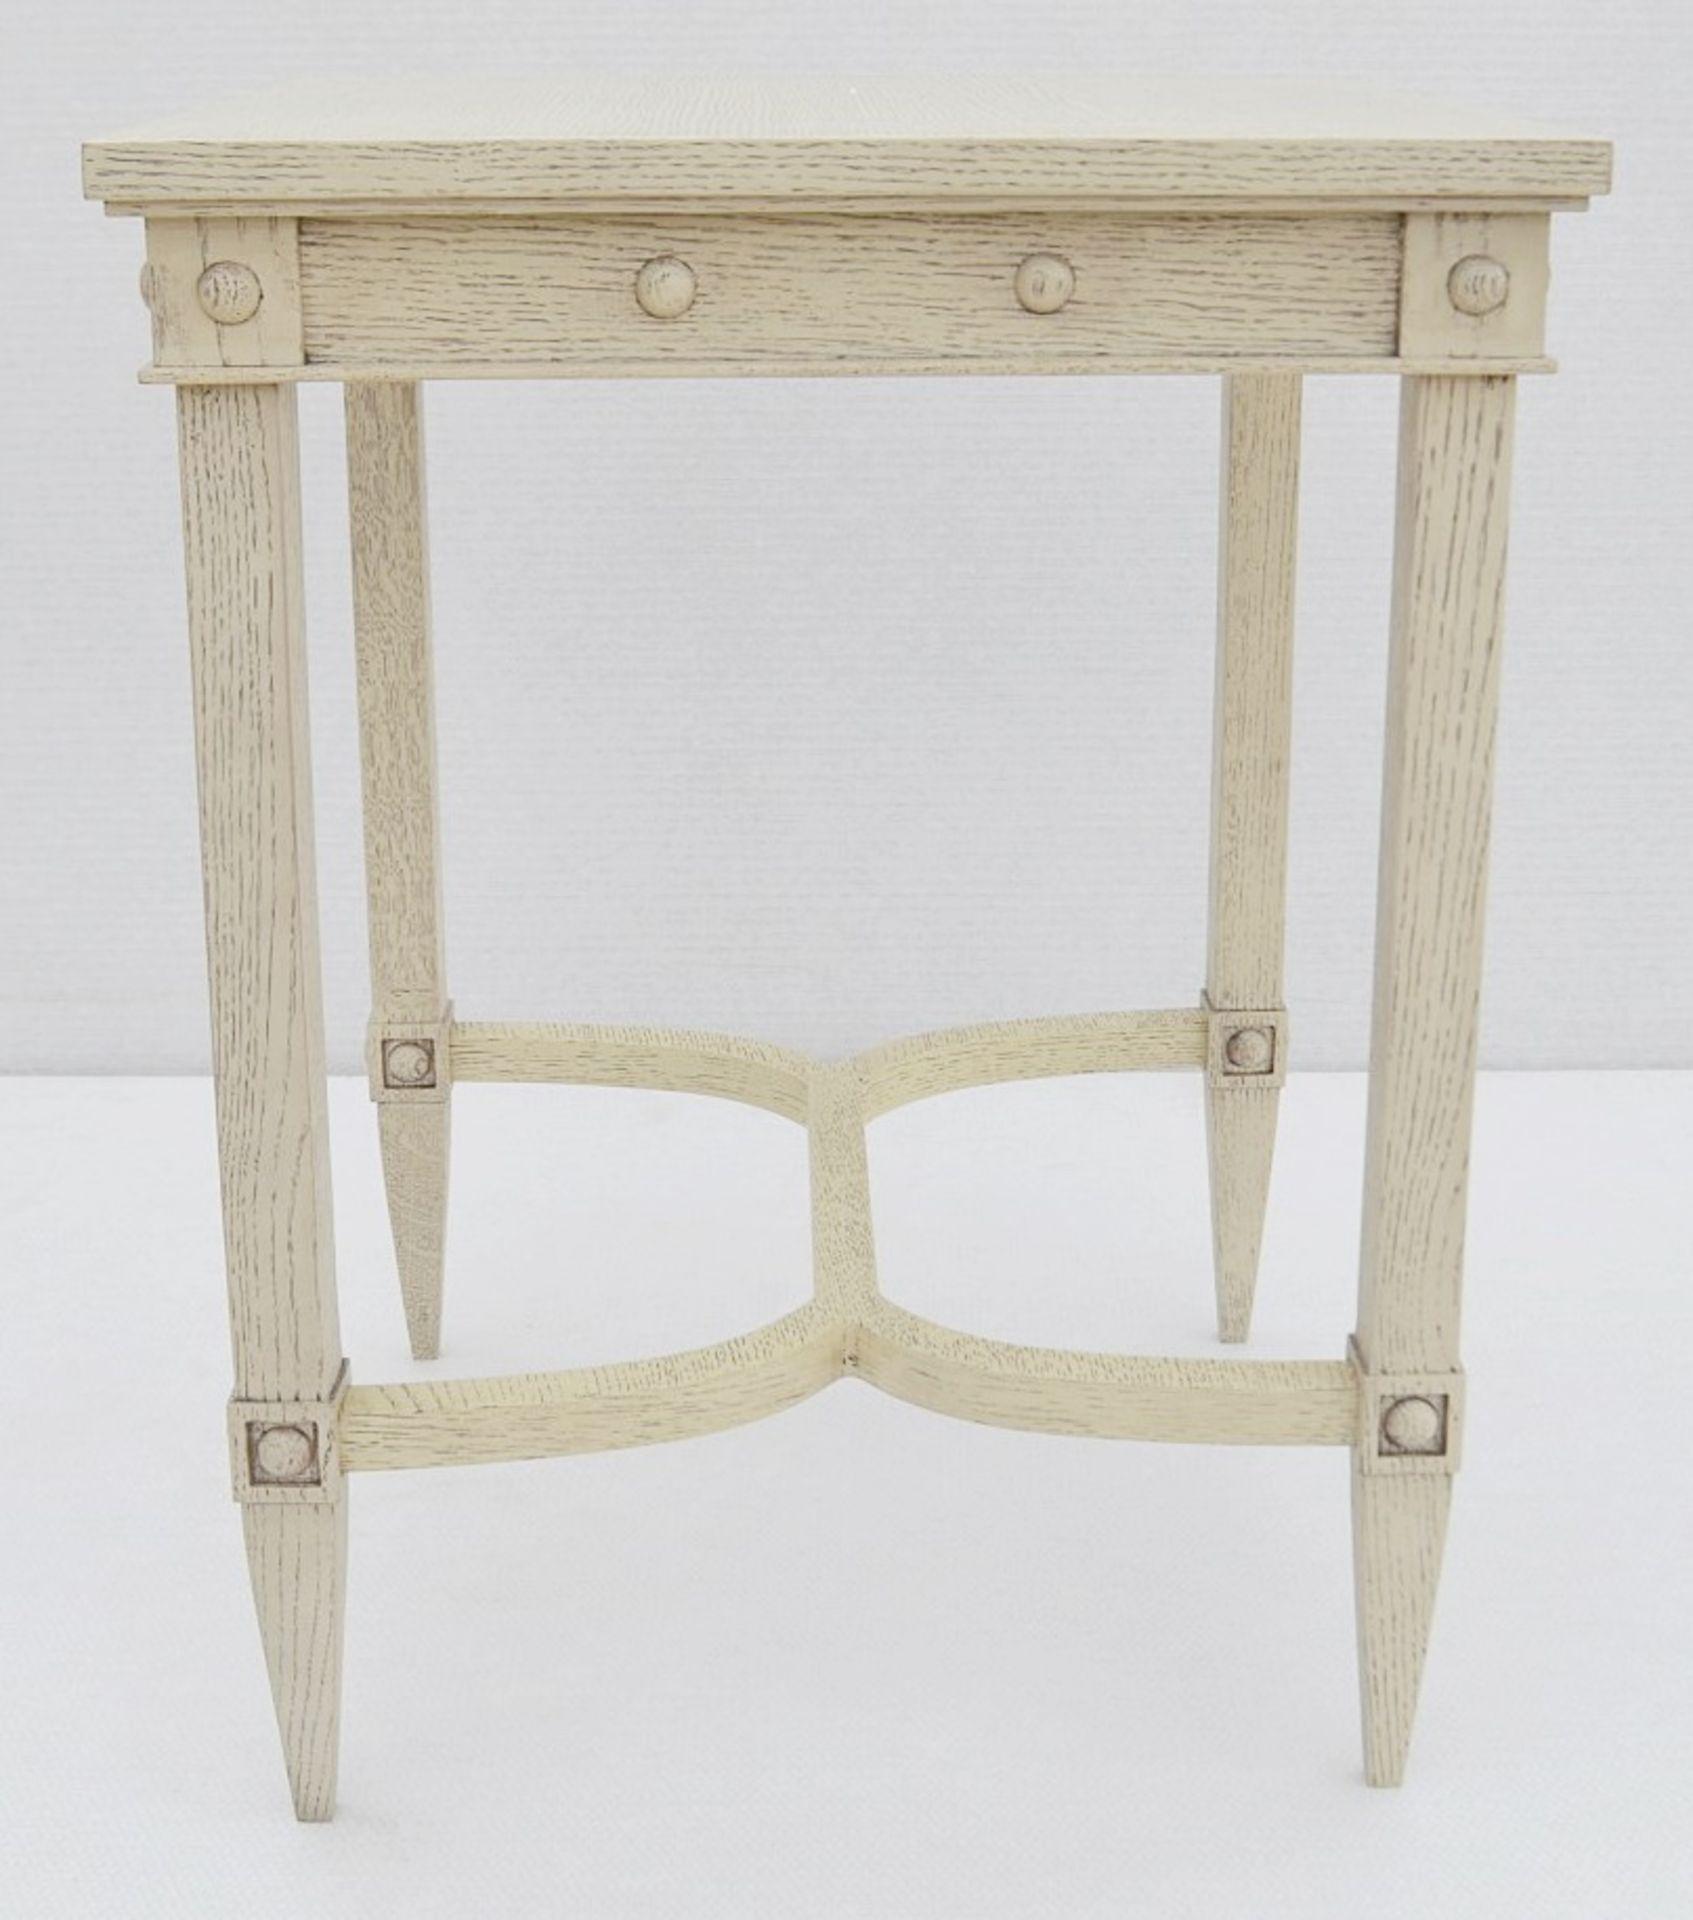 1 x JUSTIN VAN BREDA 'Thomas' Designer Georgian-inspired Table In Limed Grey Oak - RRP £1,320 - Image 2 of 6